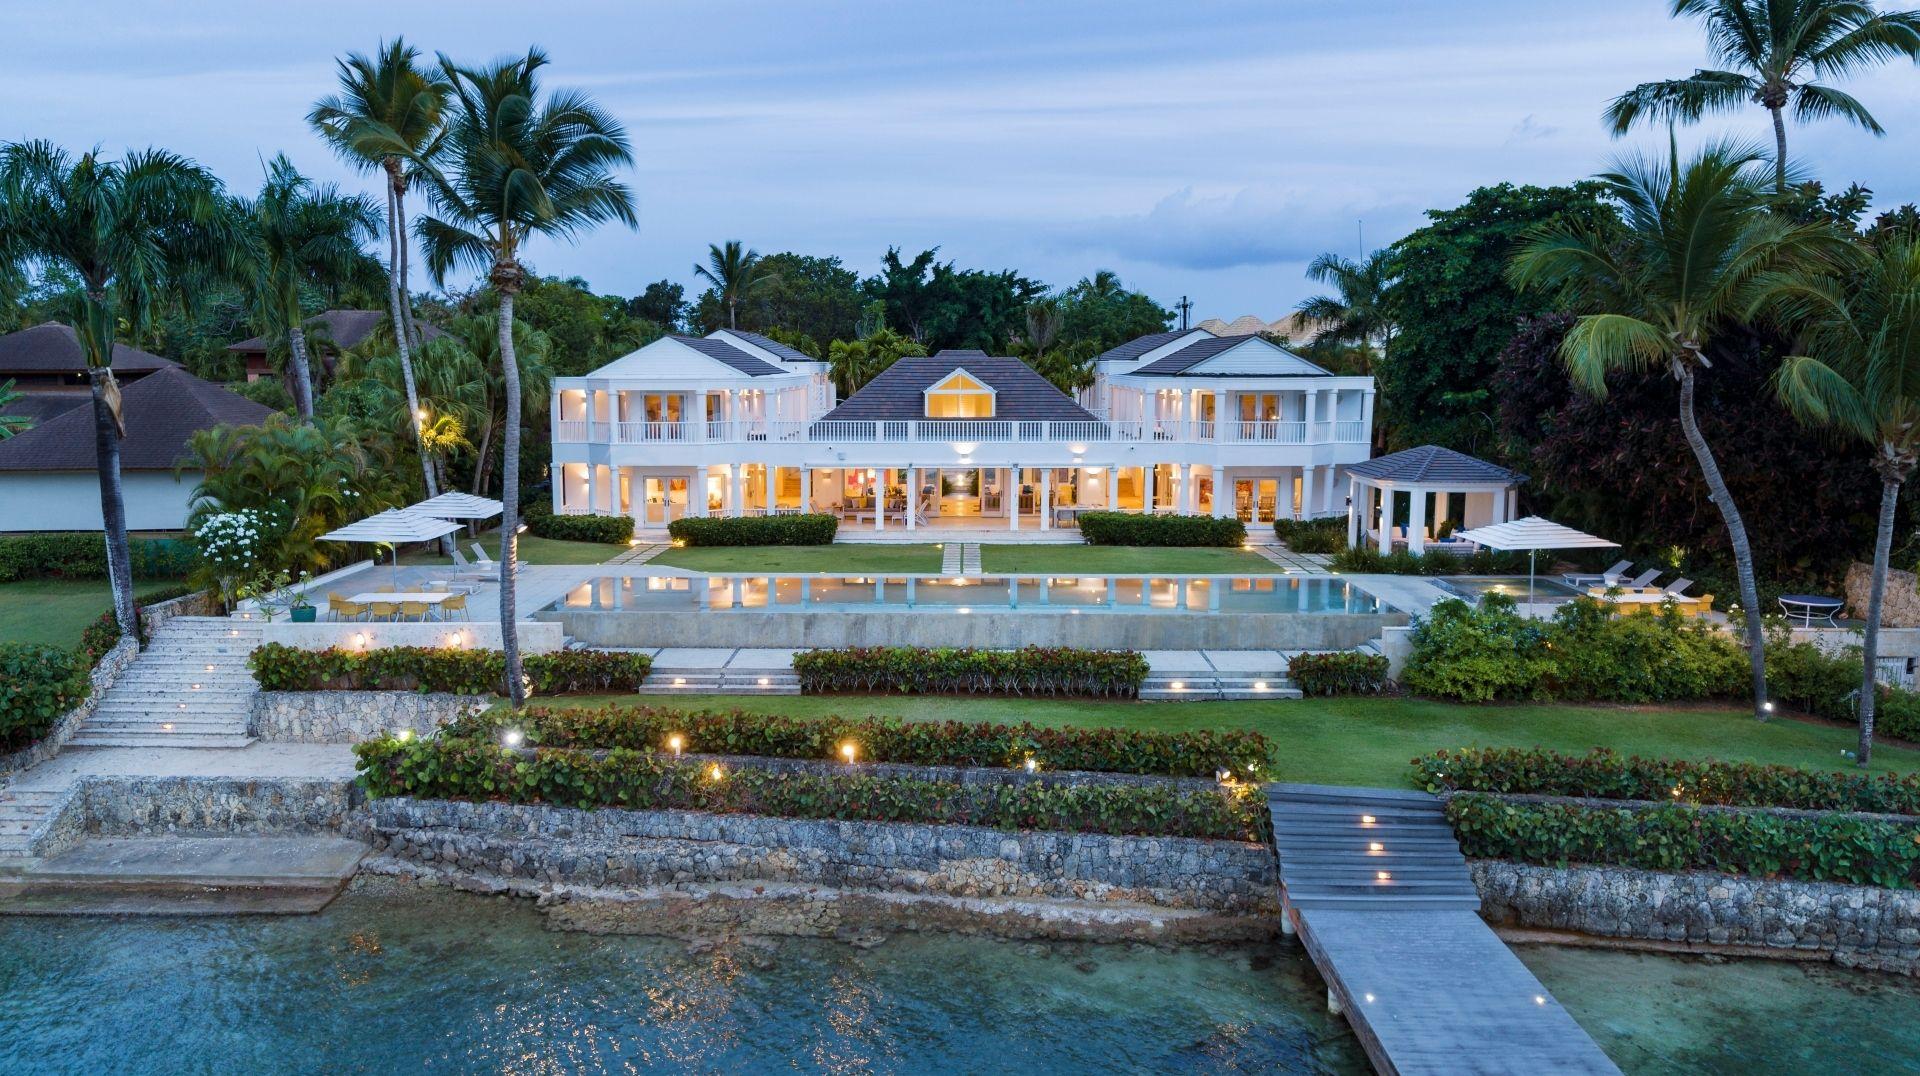 Ocean Villas of stature